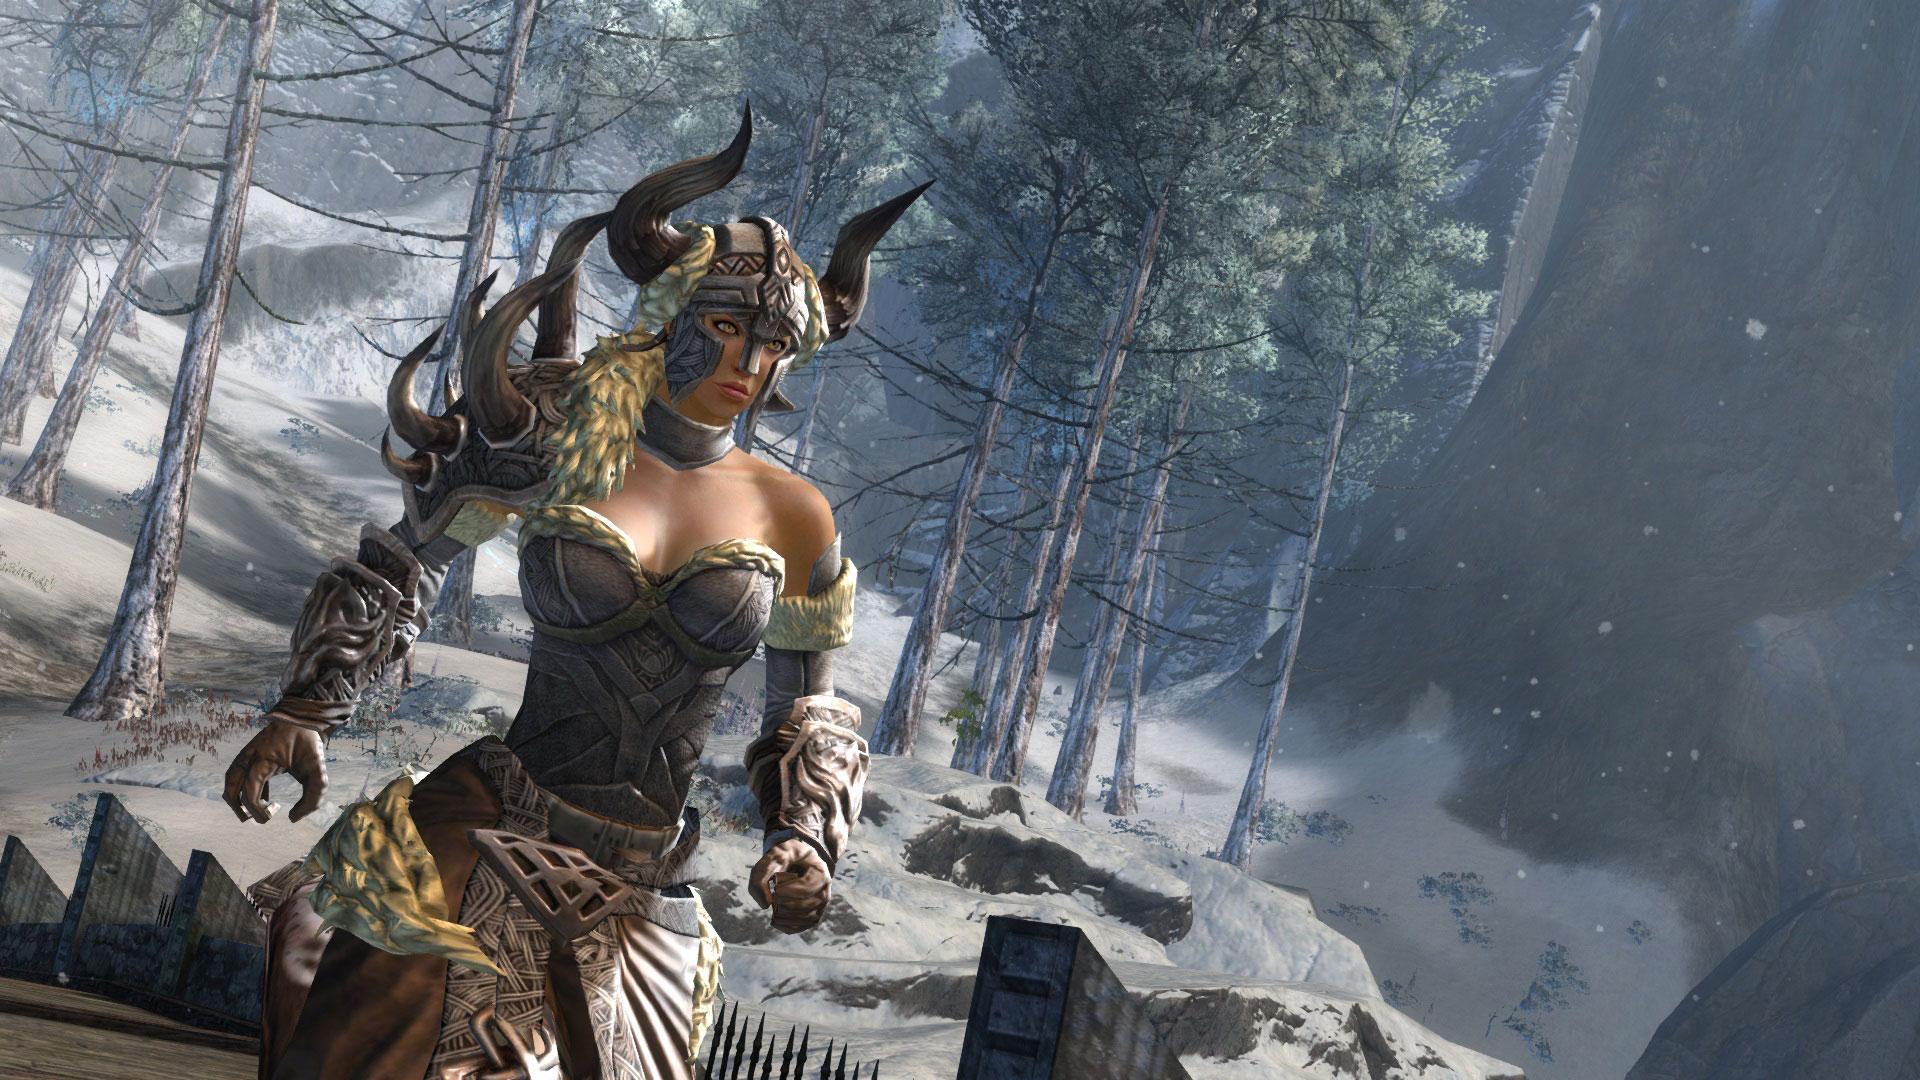 Norn female cultural armor